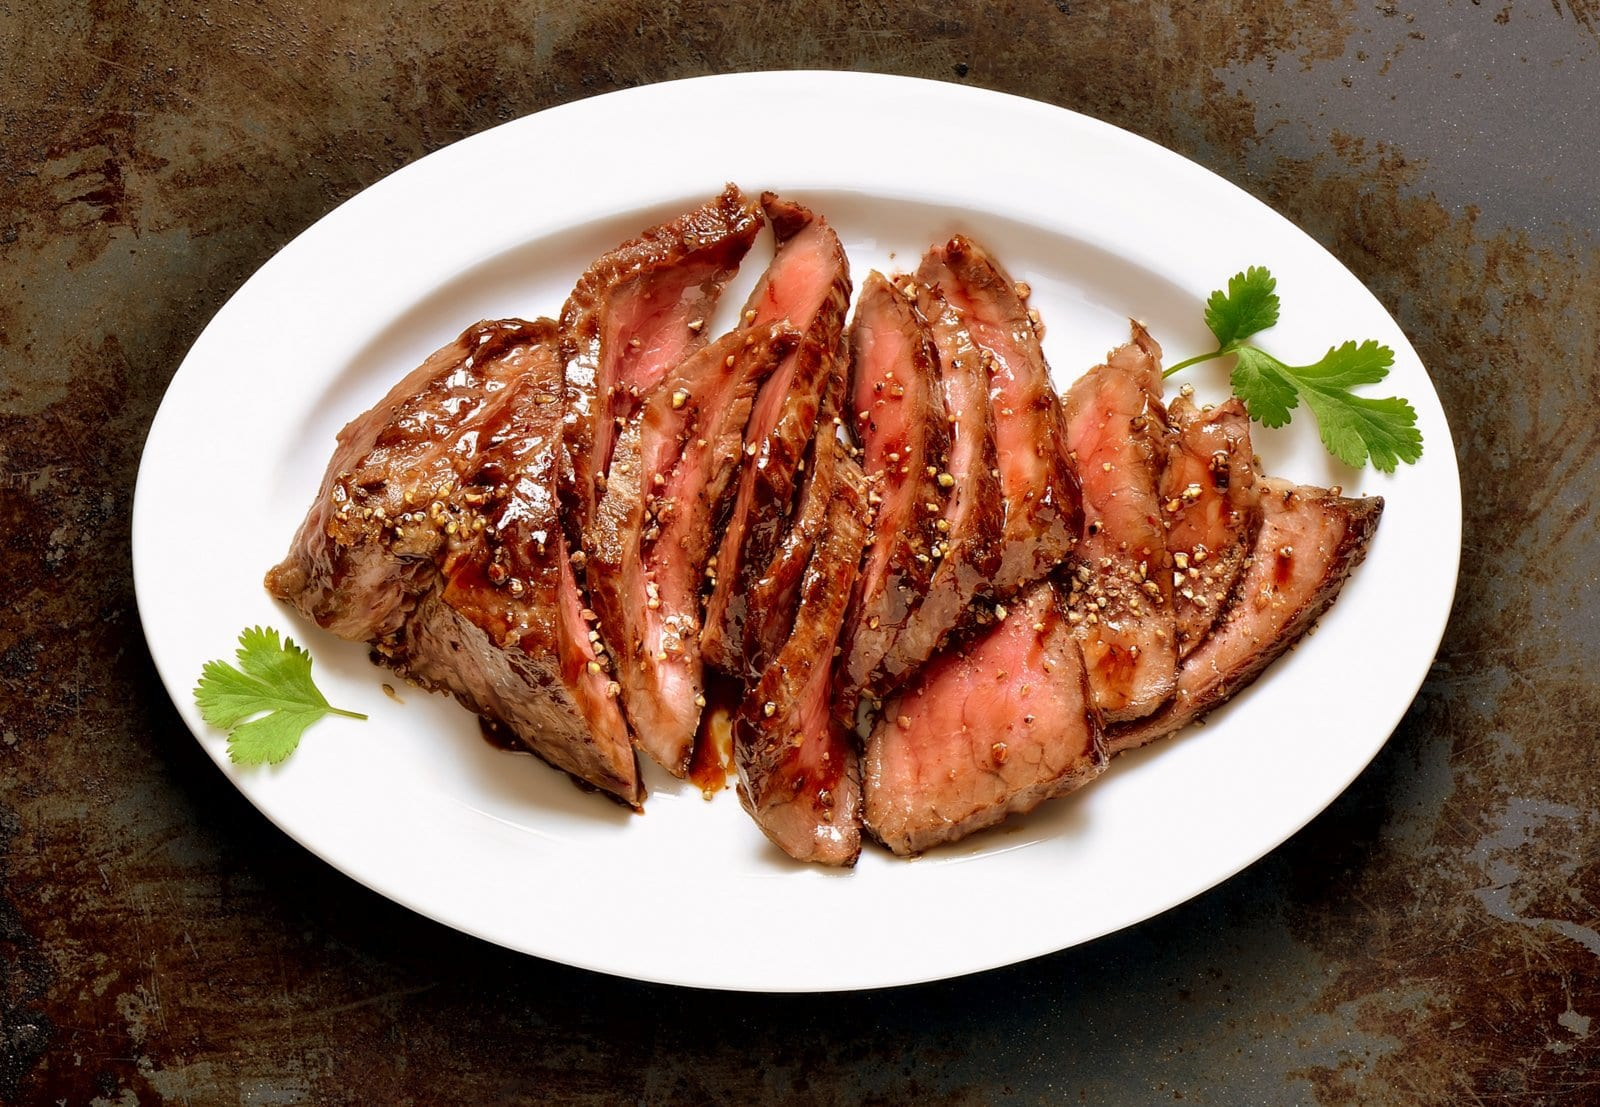 Mai tai steak - Retro recipe for flank steak with pineapple juice marinade (1968)